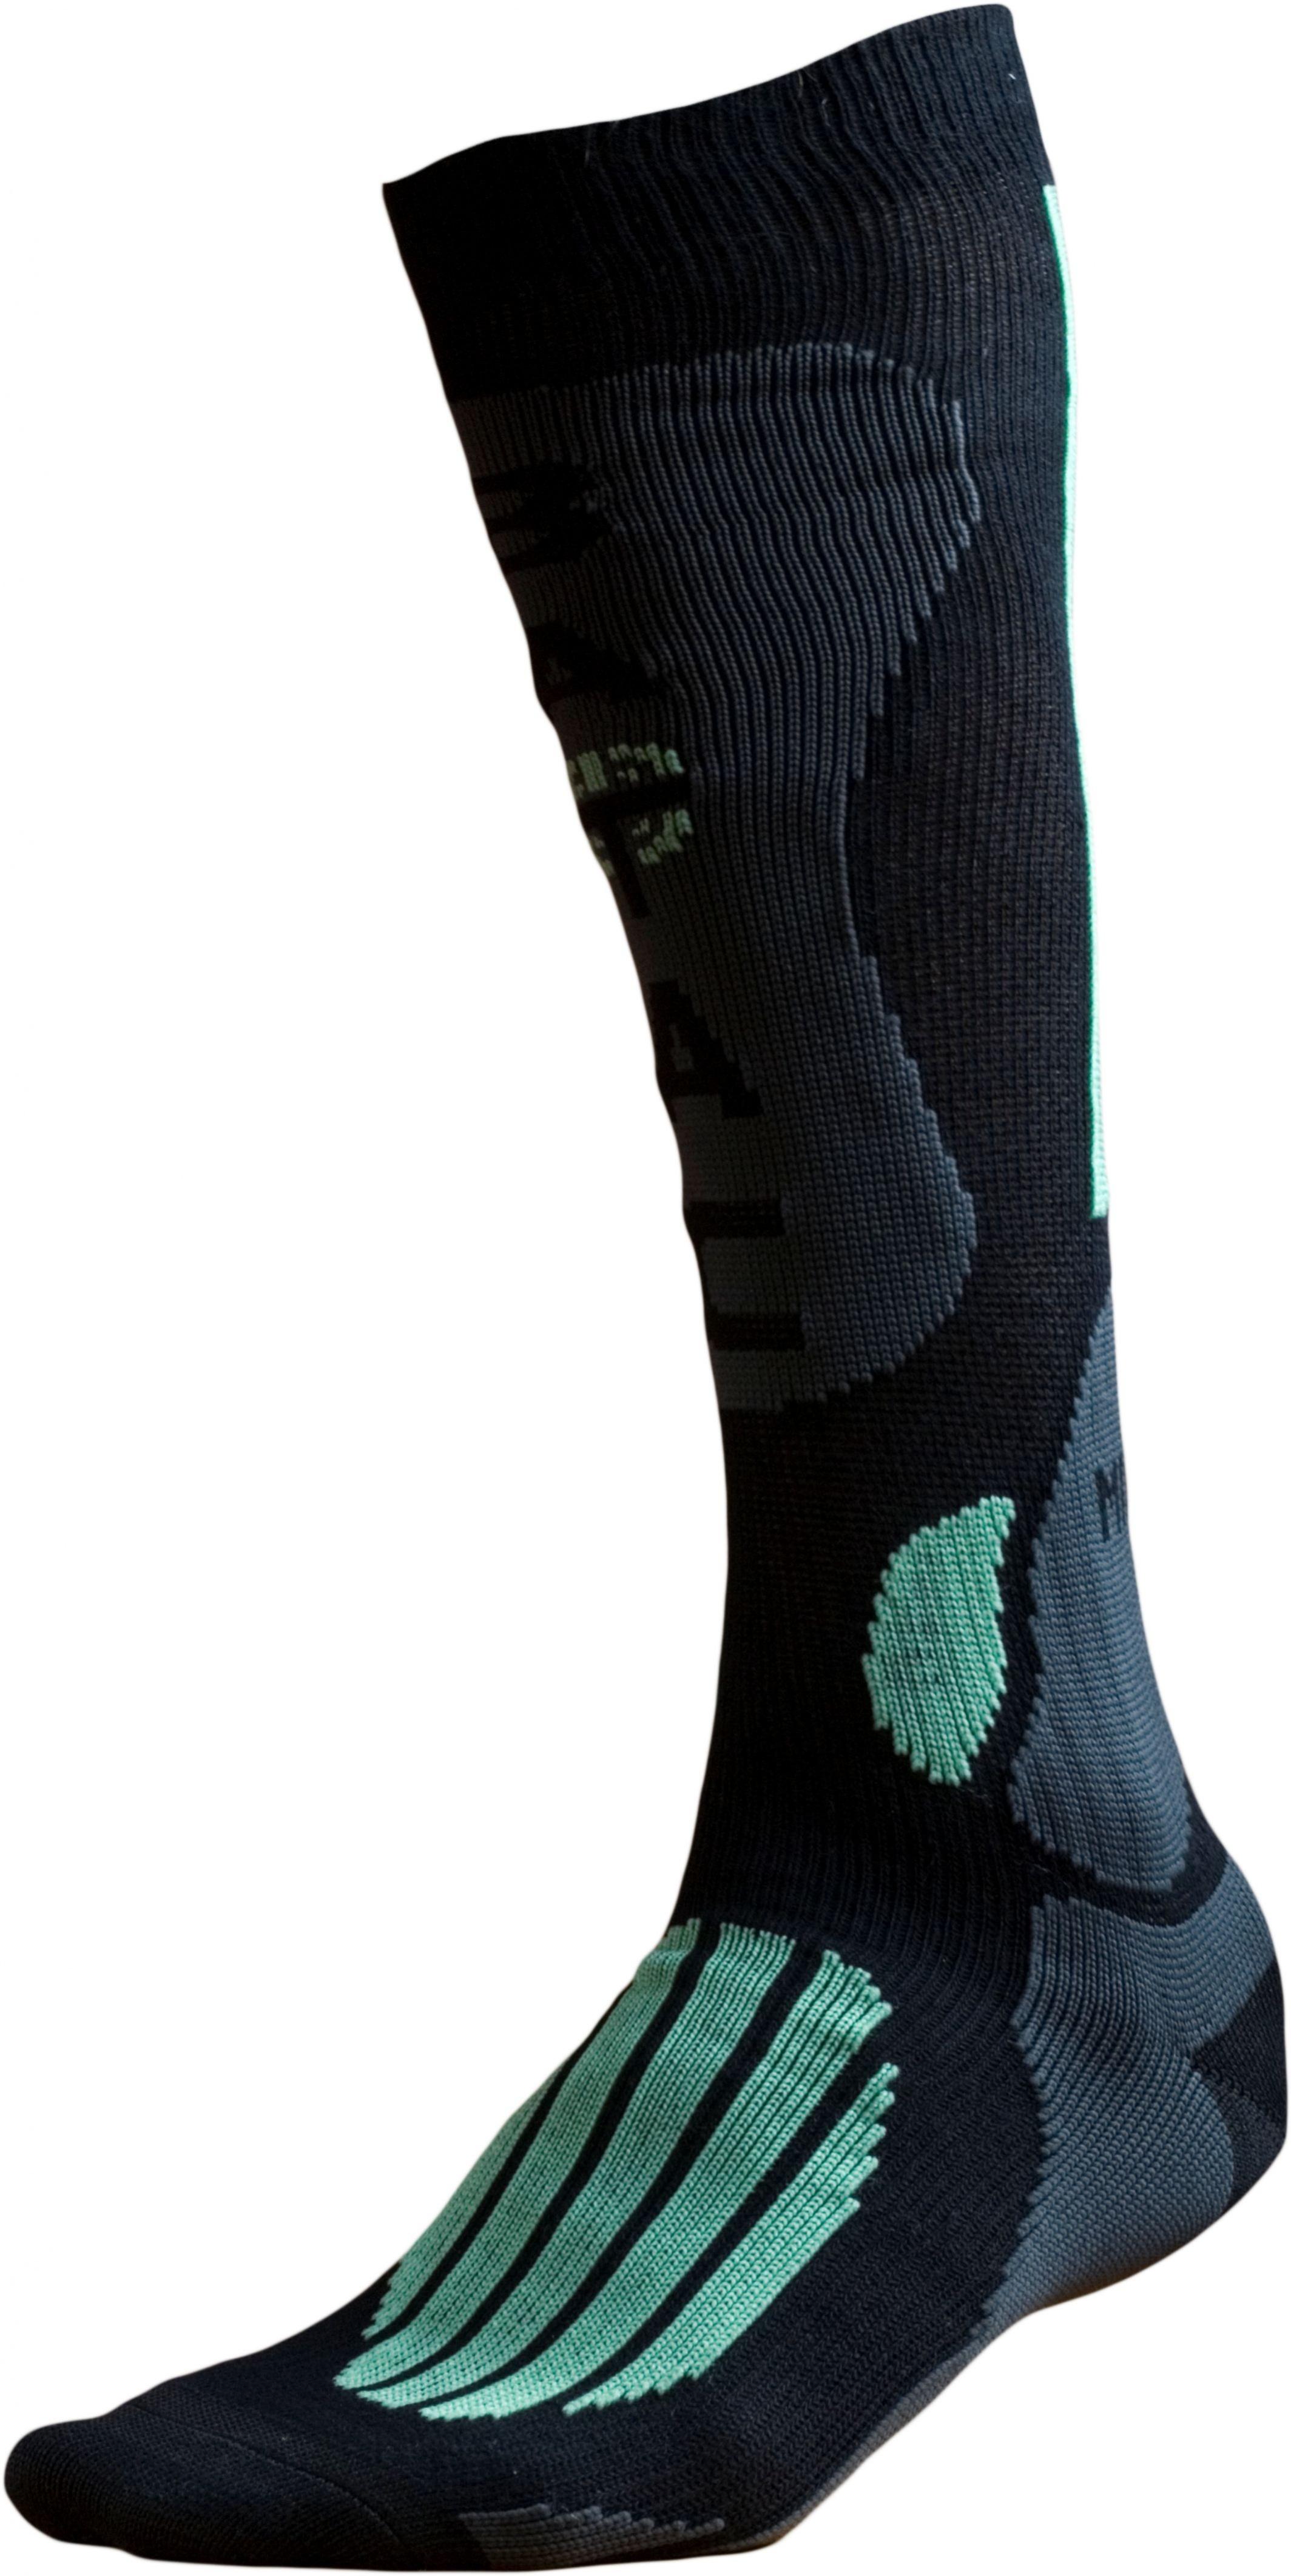 Ponožky BATAC Mission MI01 vel. 39-41 - black/green